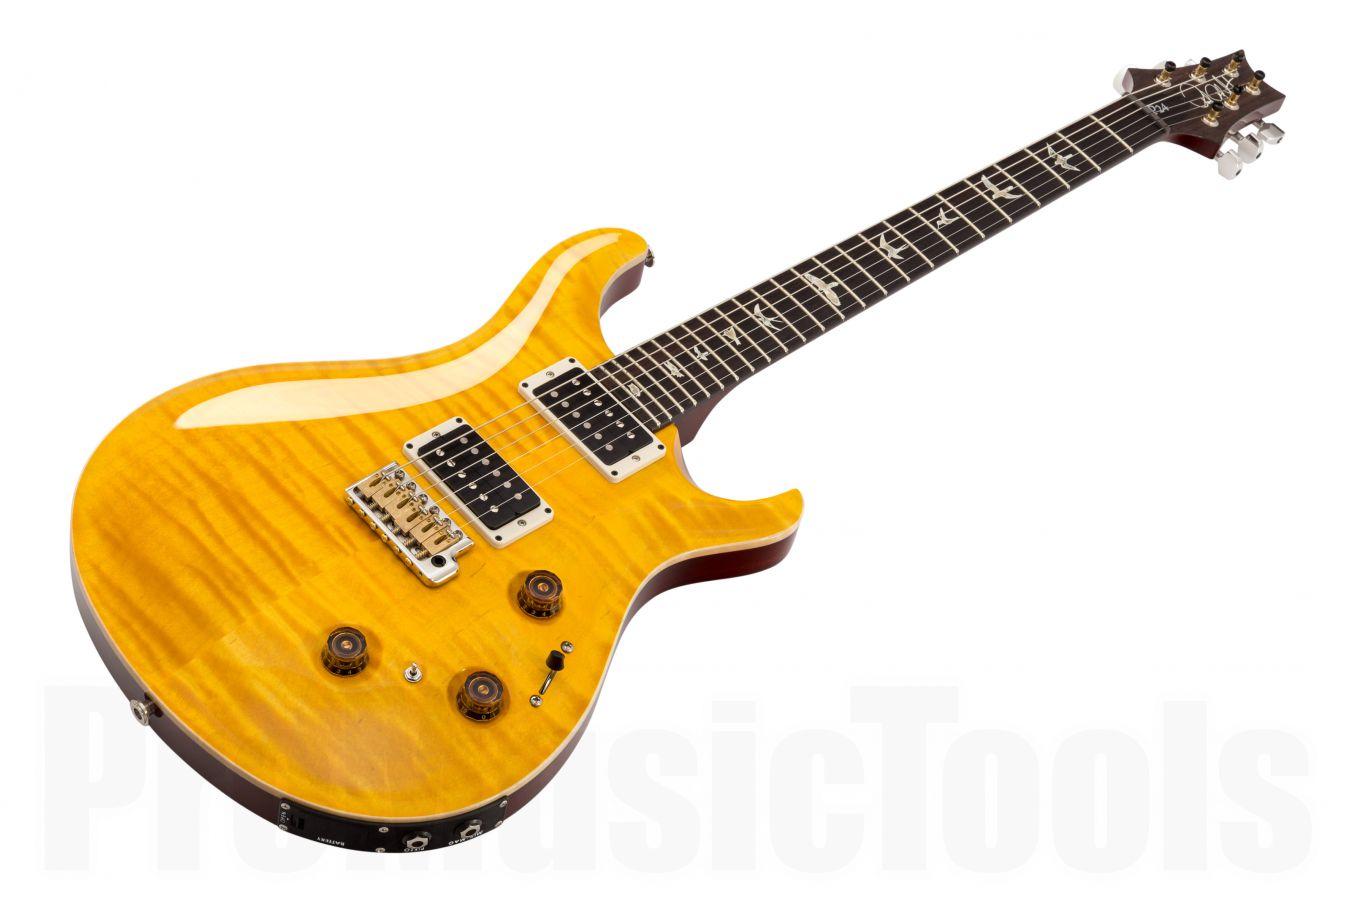 PRS USA Custom 24 Piezo (P24) Trem FD - Faded Vintage Yellow